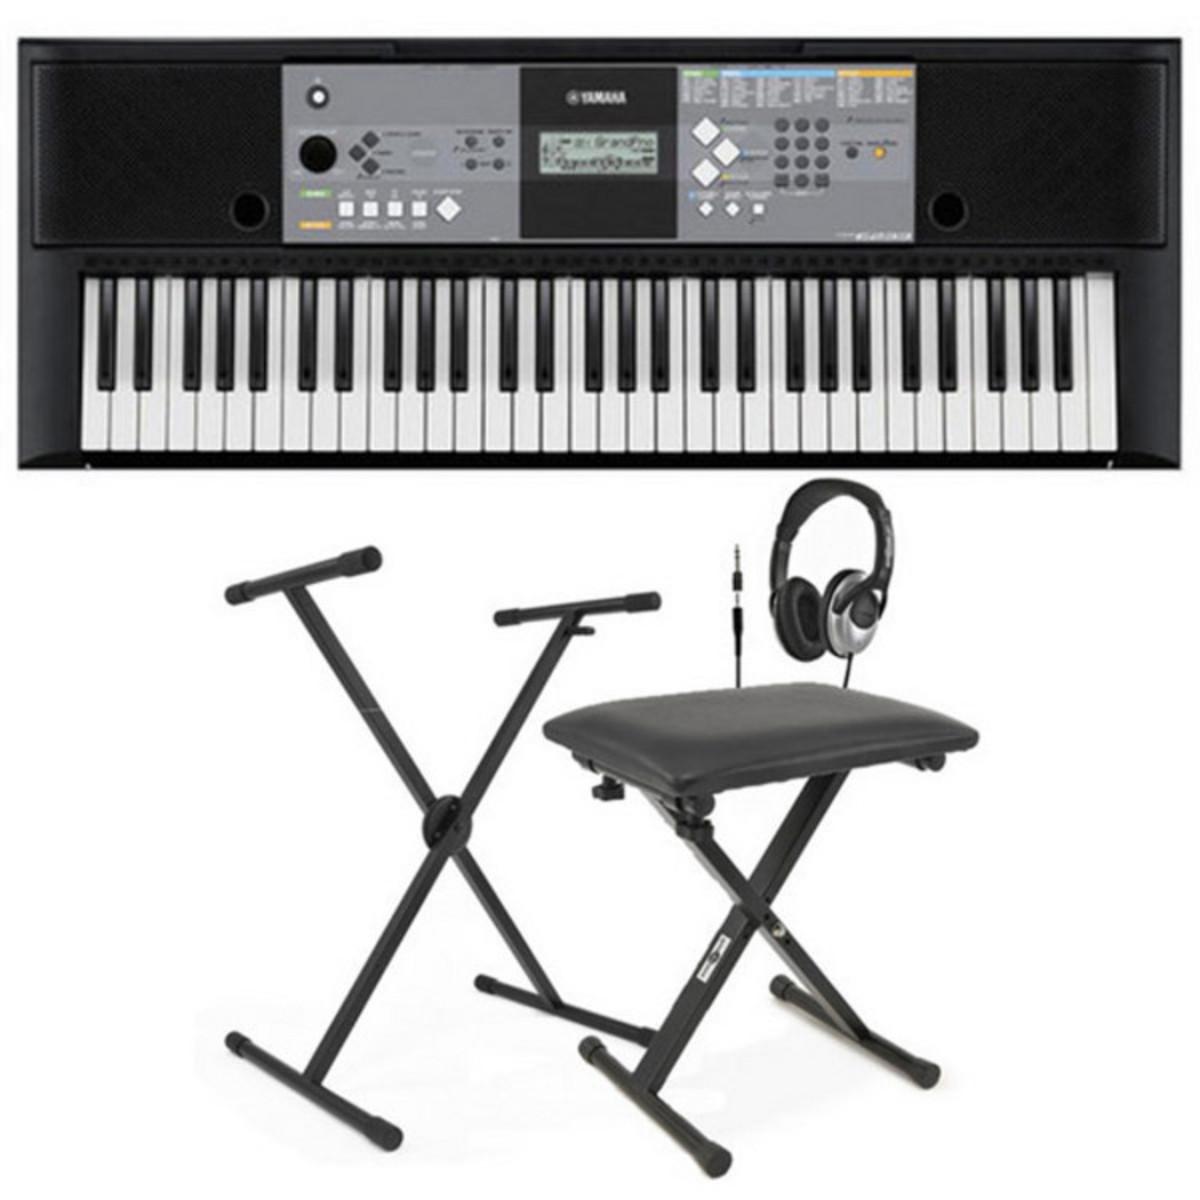 Disc yamaha psr e233 portable keyboard with stand bench for Yamaha psr stand